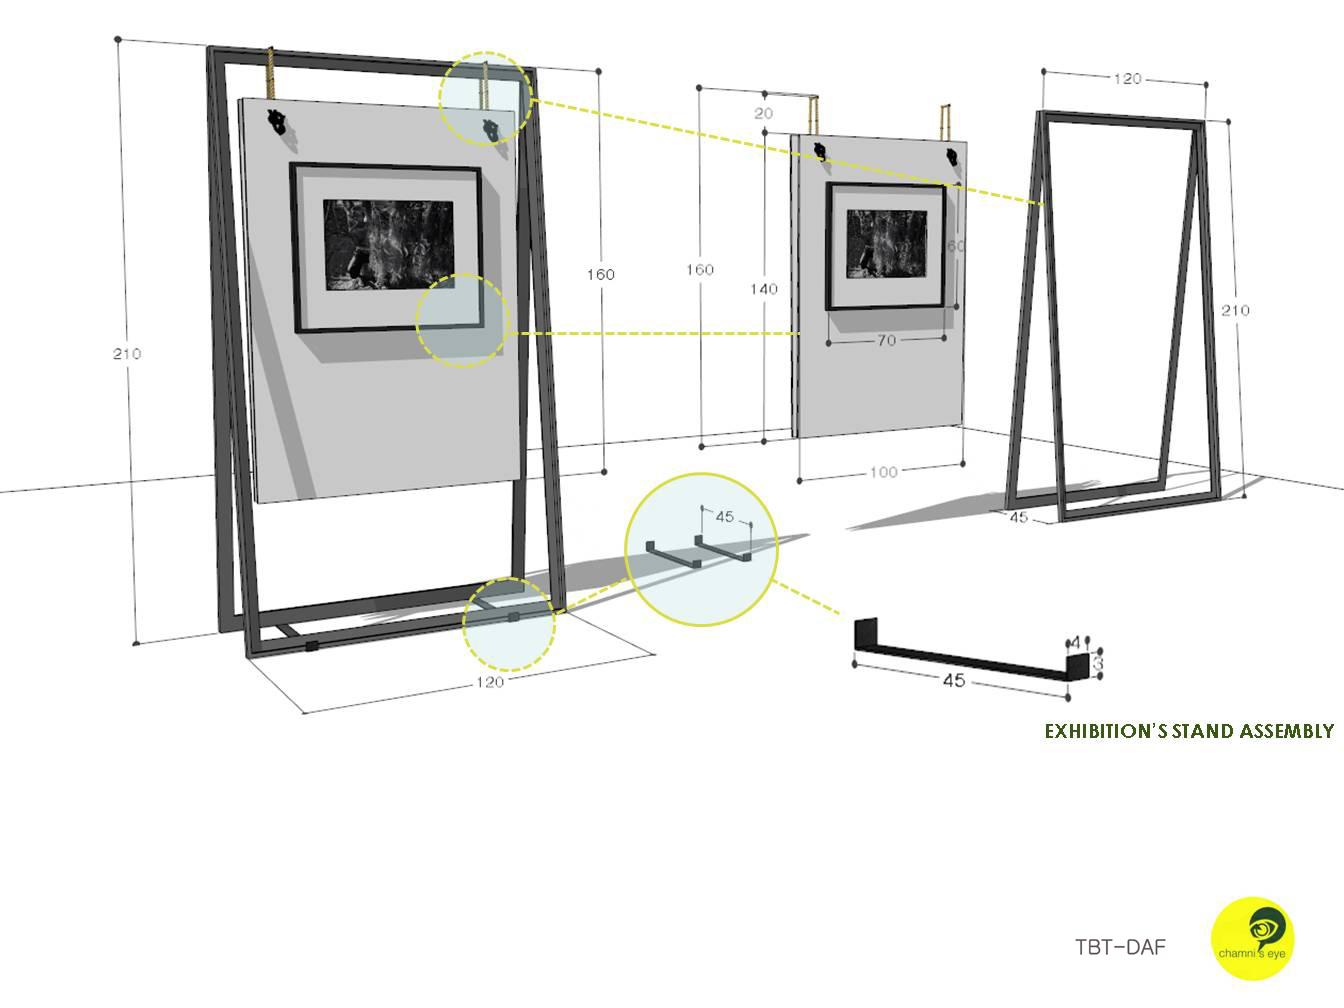 TBT-DAF interior design monsoon exhibition bw photo 14